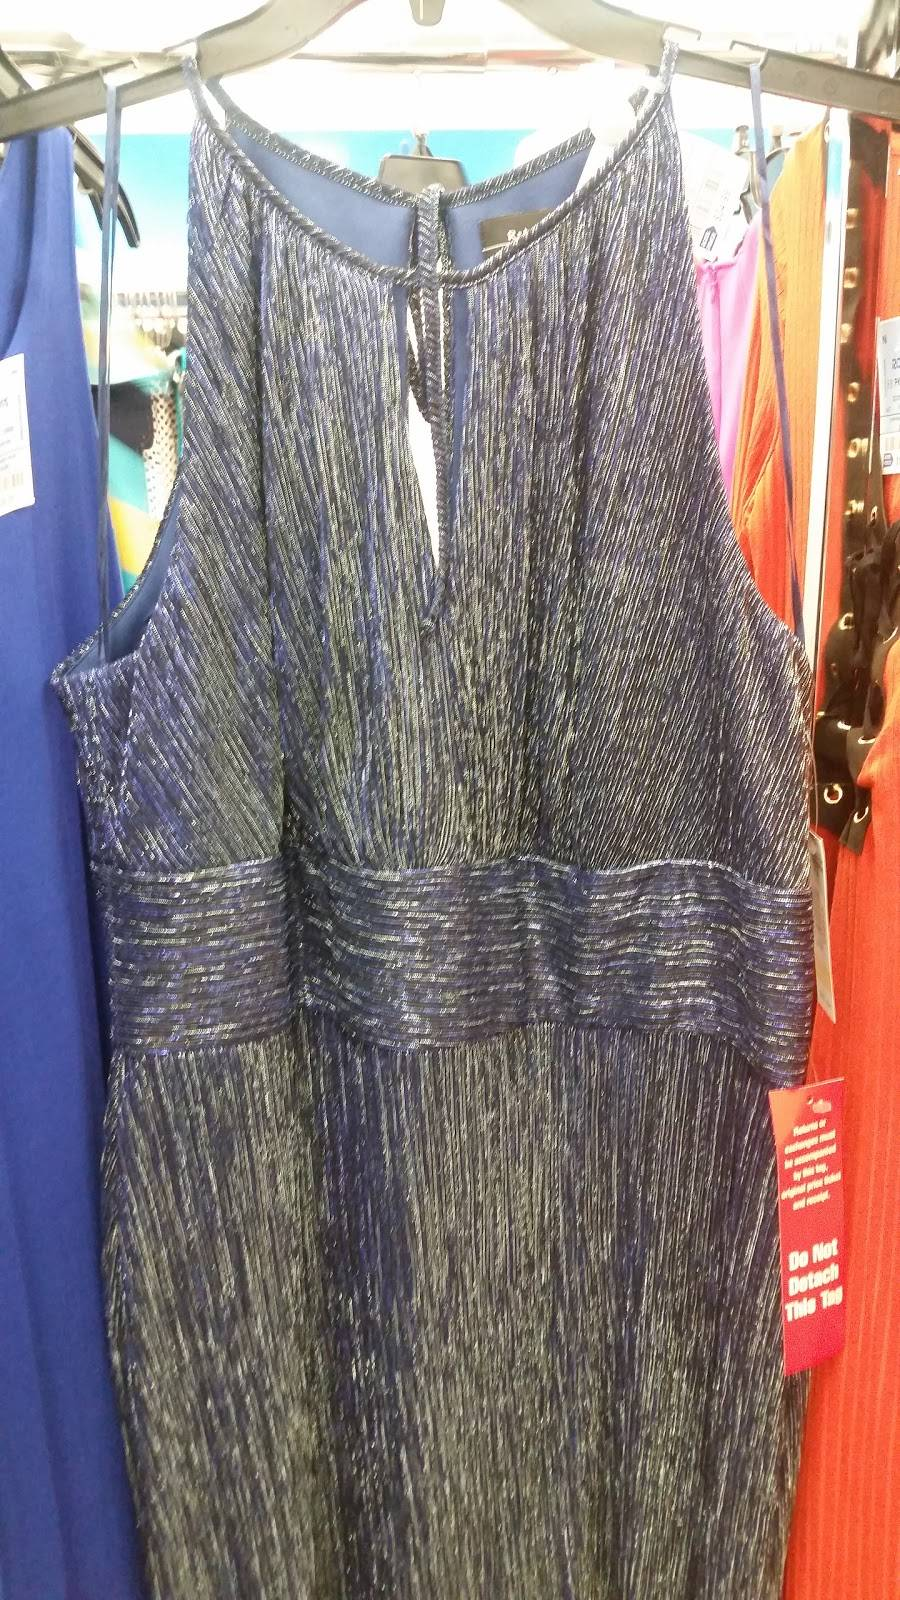 Ross Dress for Less, 20 Pavilion Way, Lexington, KY 20, USA